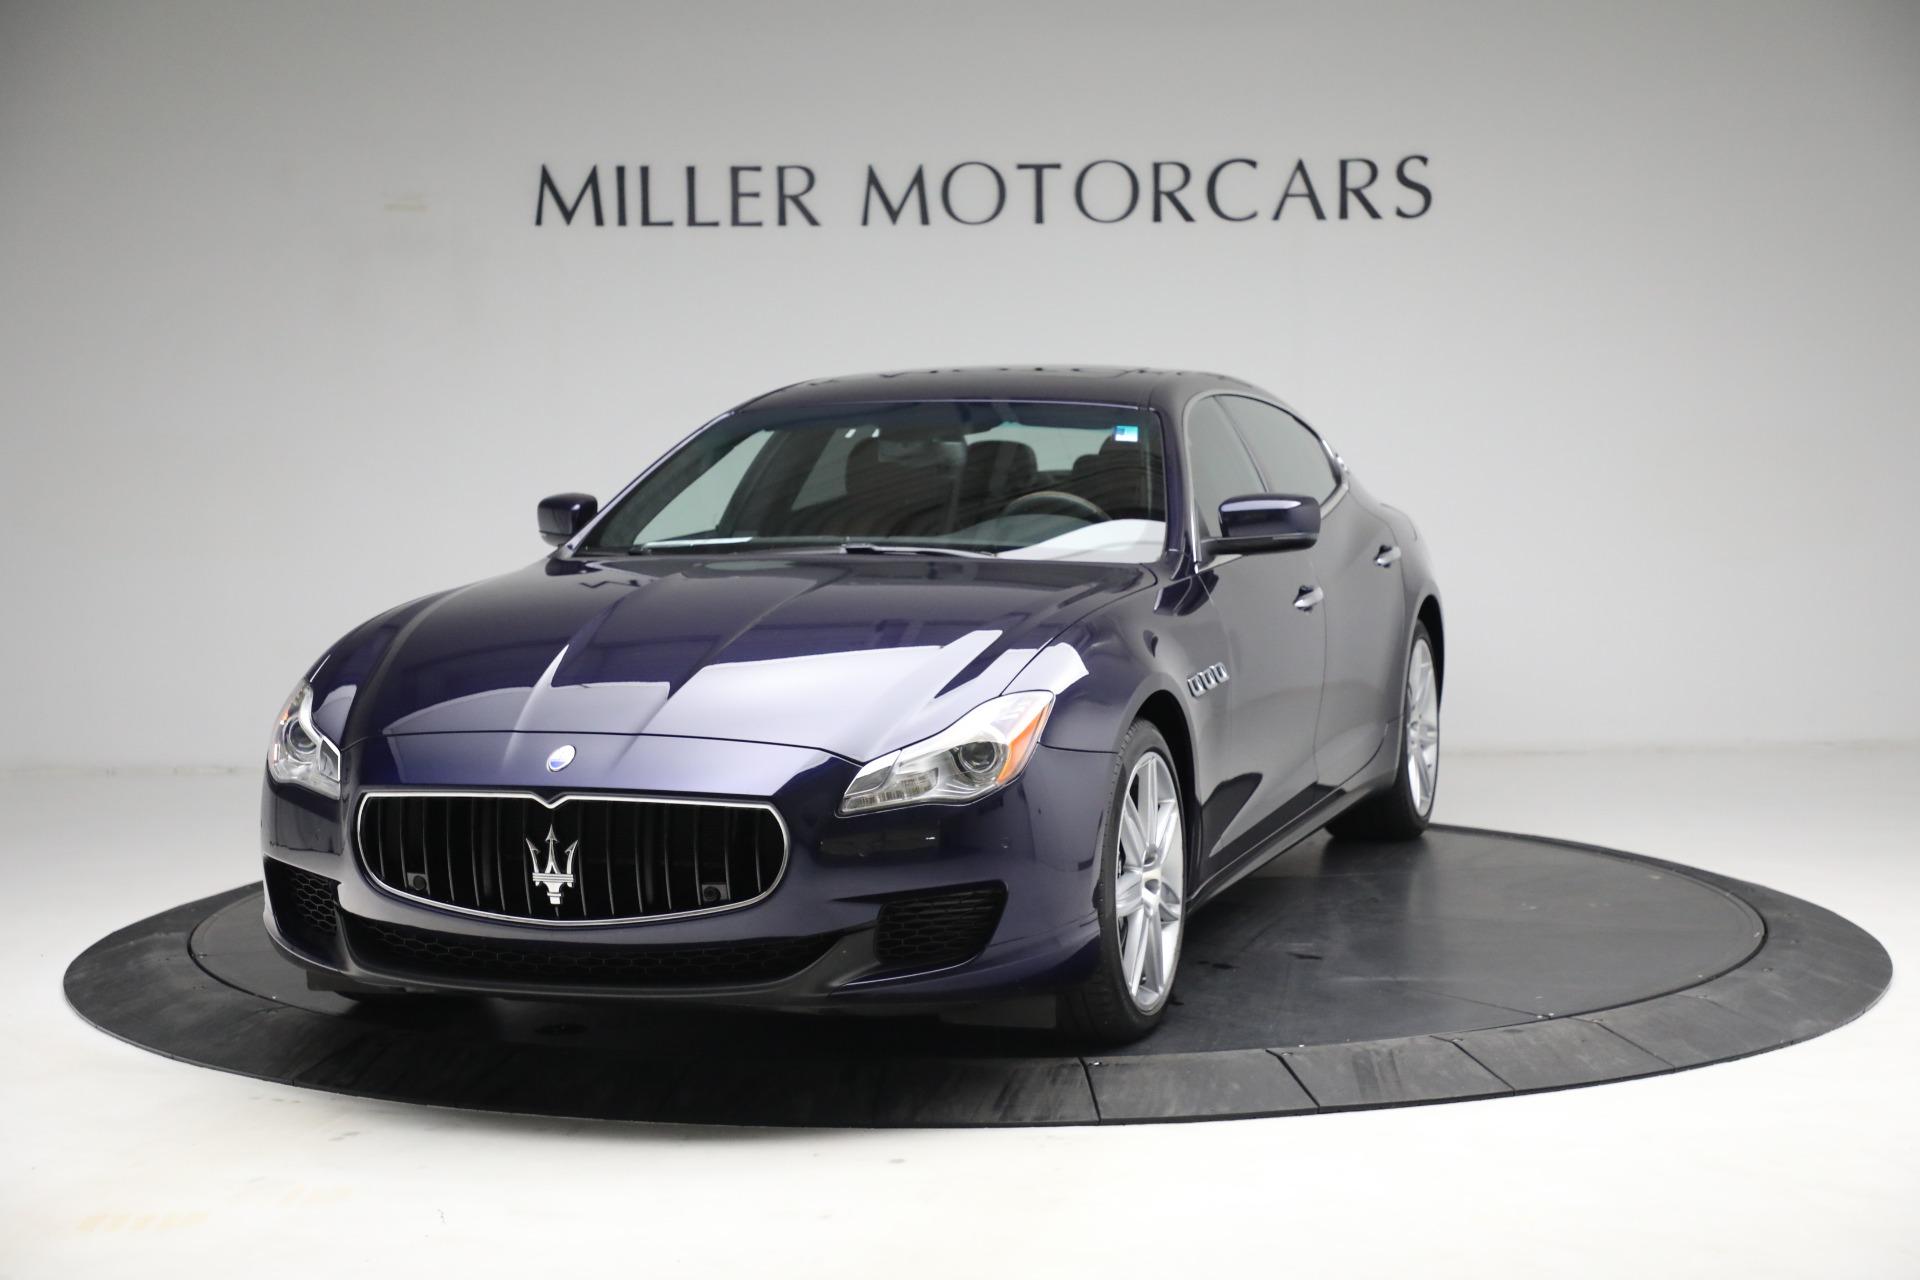 Used 2014 Maserati Quattroporte S Q4 for sale $42,900 at Bentley Greenwich in Greenwich CT 06830 1